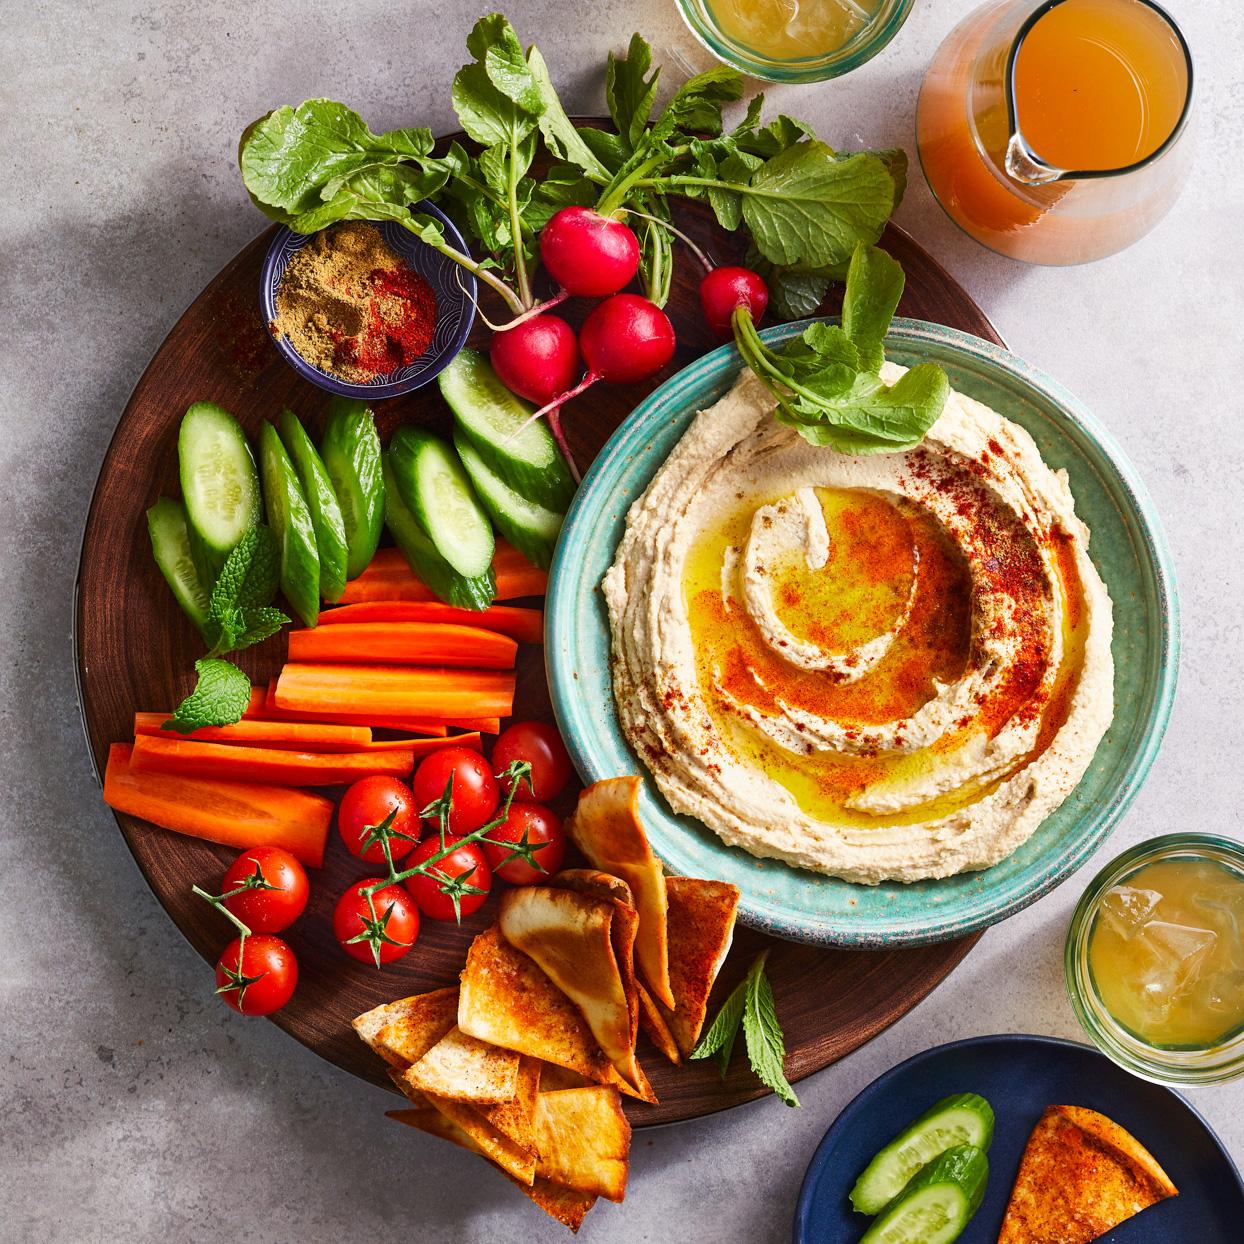 Syrian Hummus